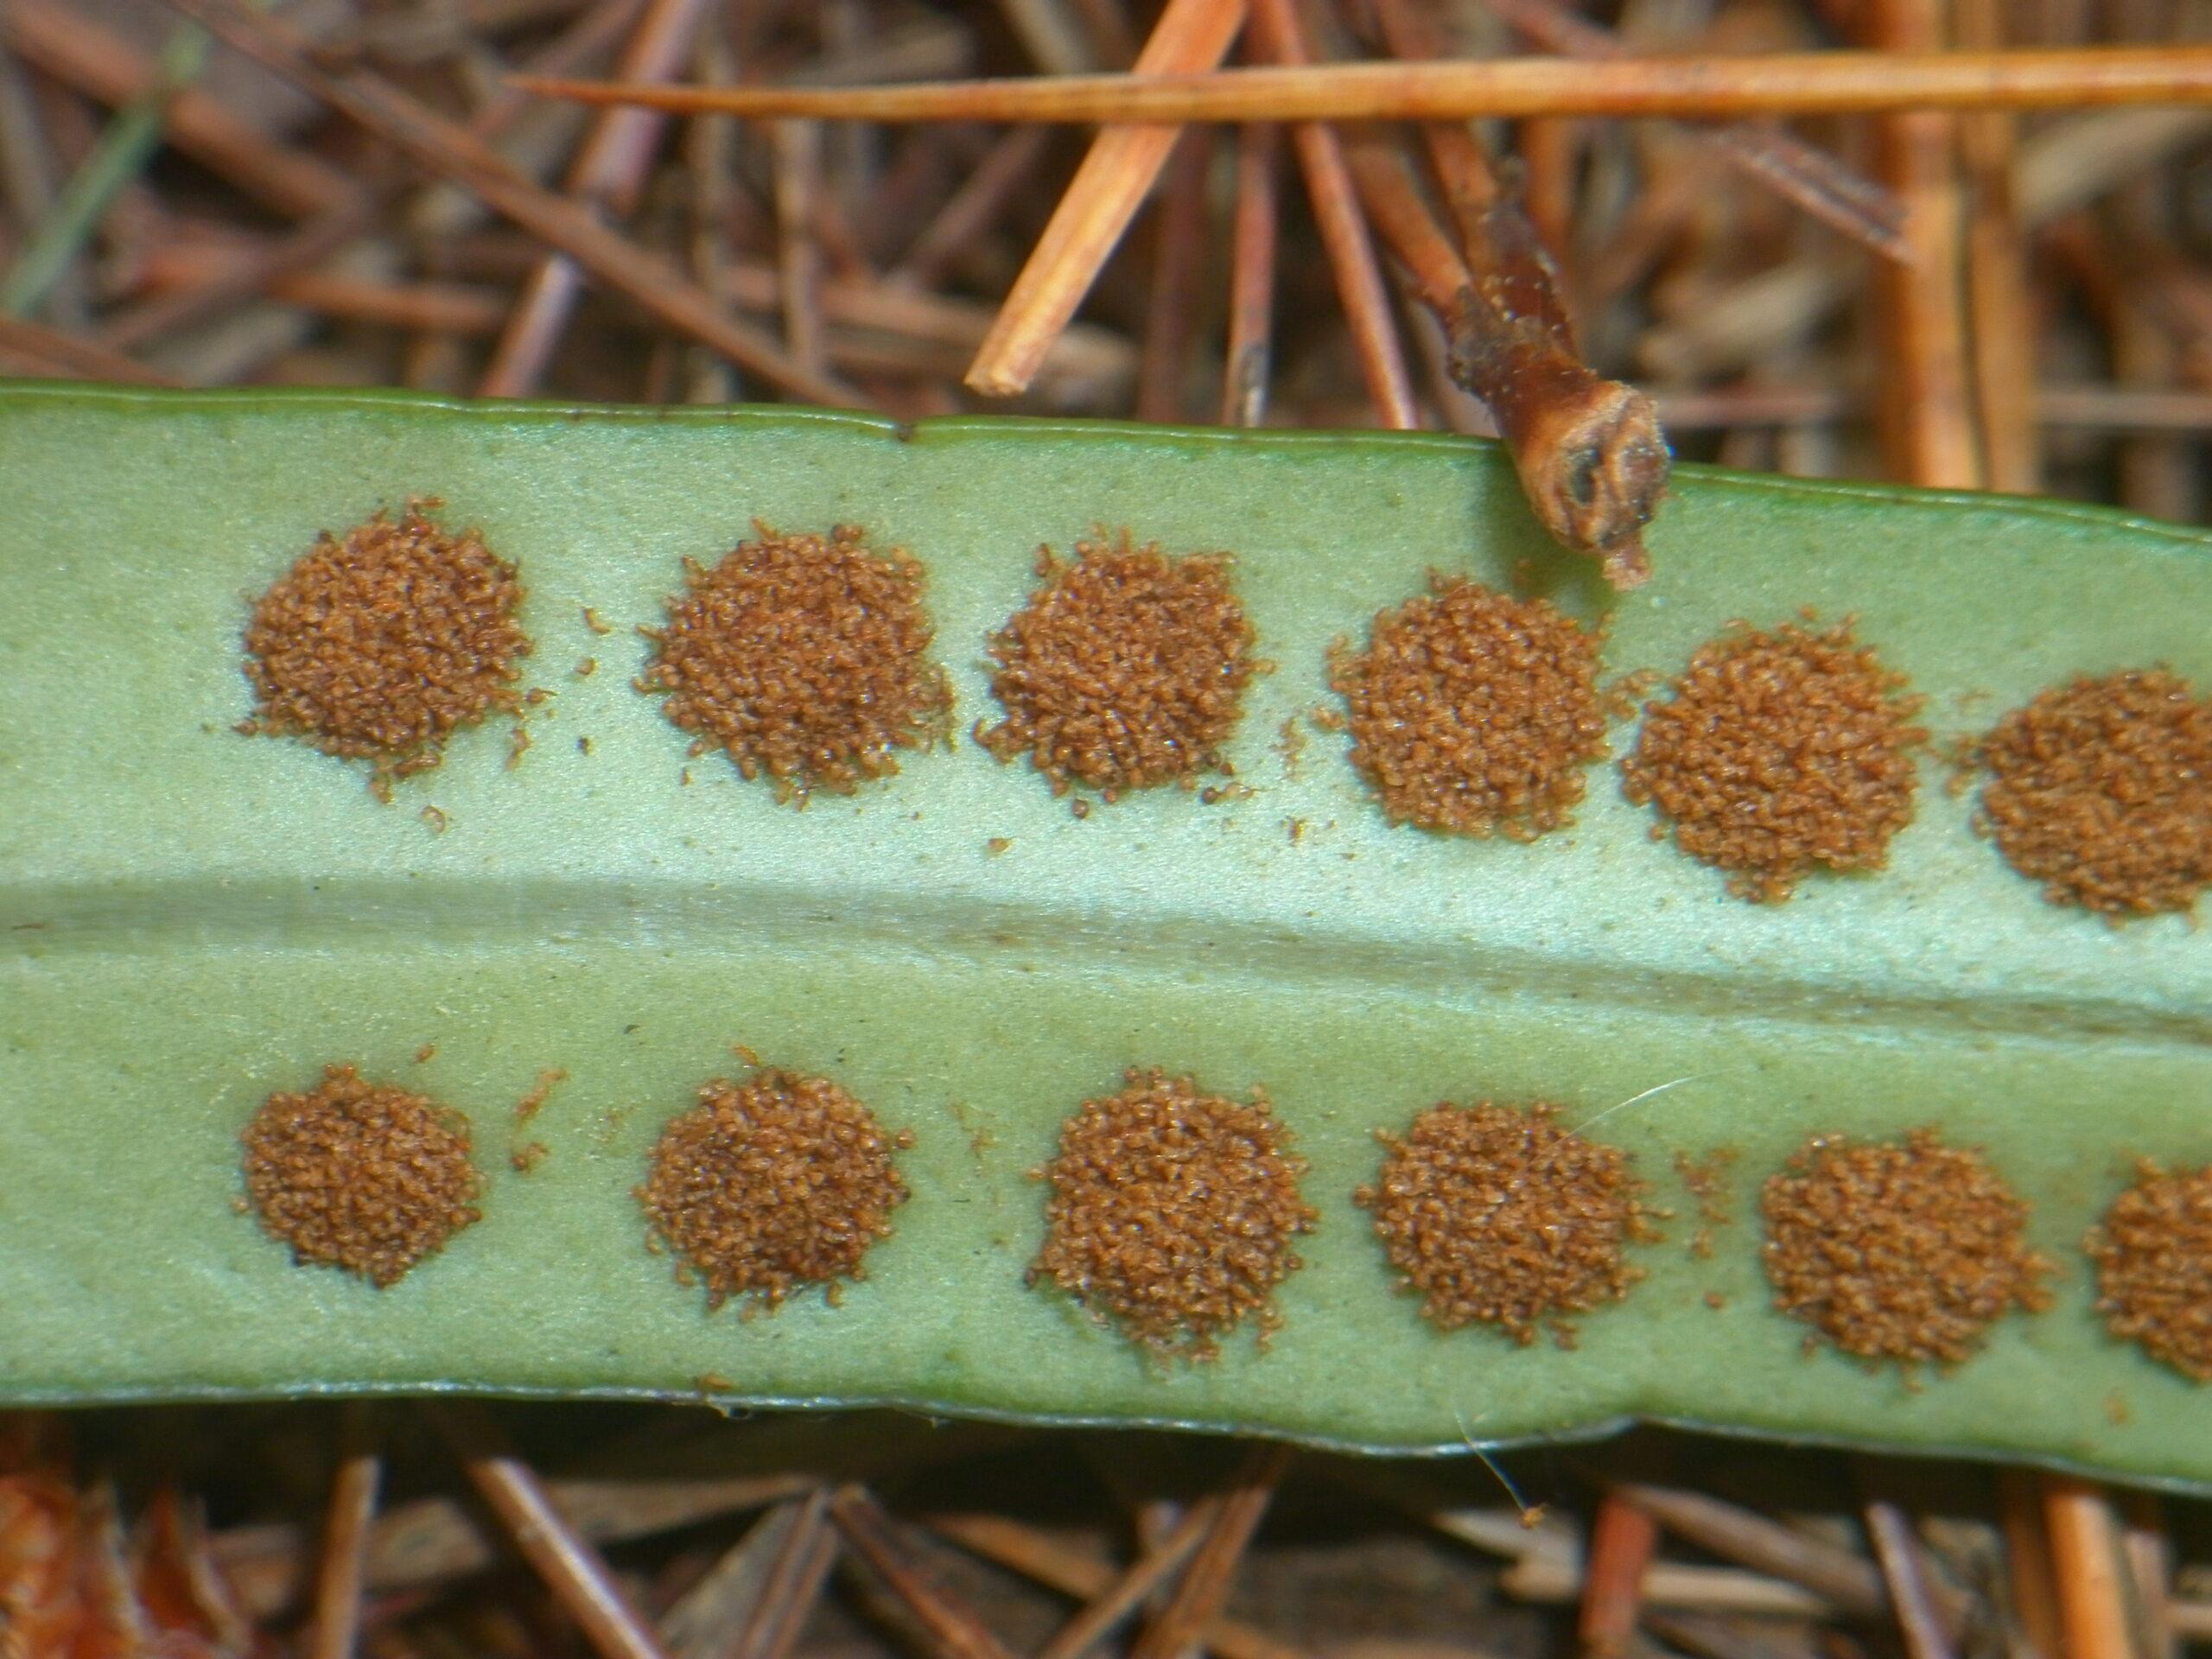 Selliguea banaensis